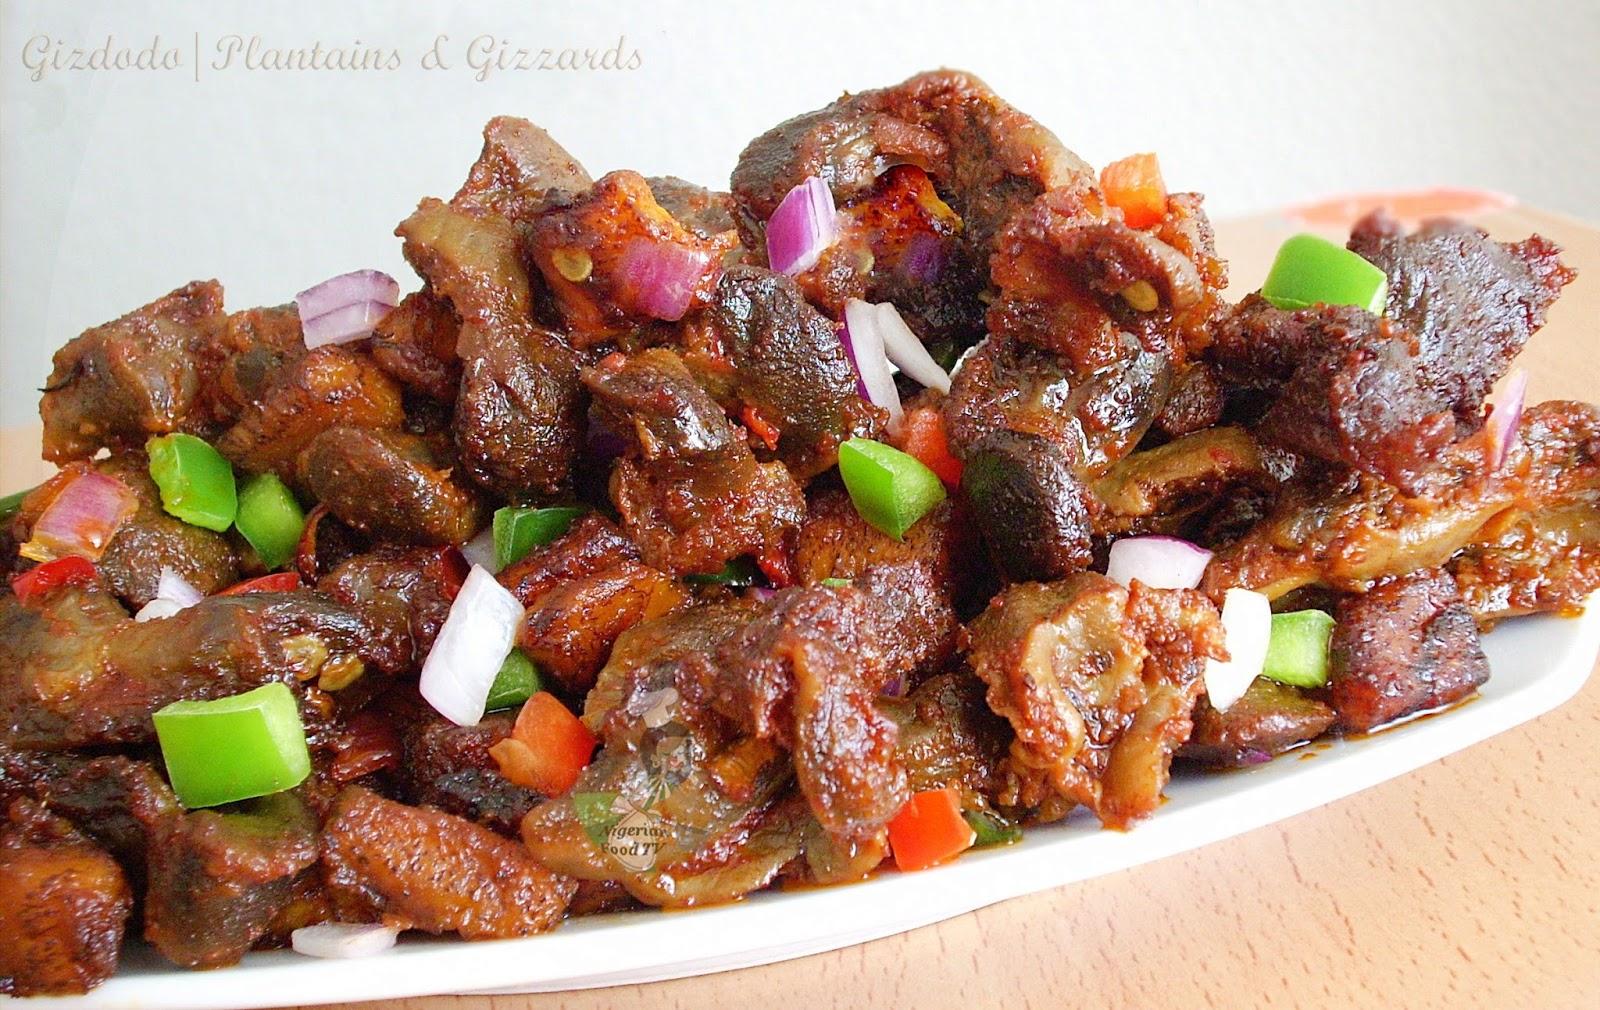 Nigerian Food Recipes, Gizdodo recipe (Gizzards and Plantains)Nigerian Recipes, dodo gizzards,Nigerian Food TV